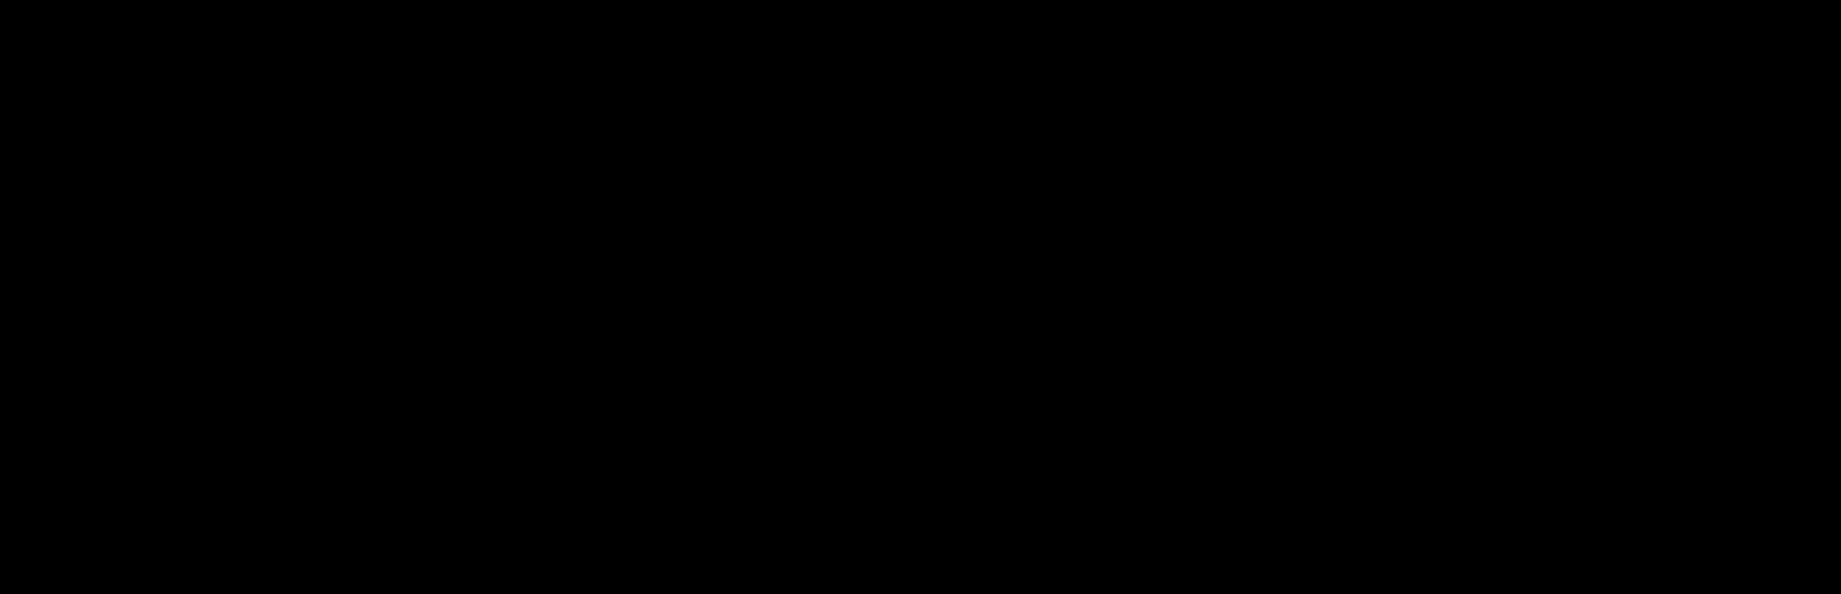 Suberoylanilide-<sup>13</sup>C<sub>6</sub>hydroxamic acid (<sup>13</sup>C<sub>6</sub>-SAHA)